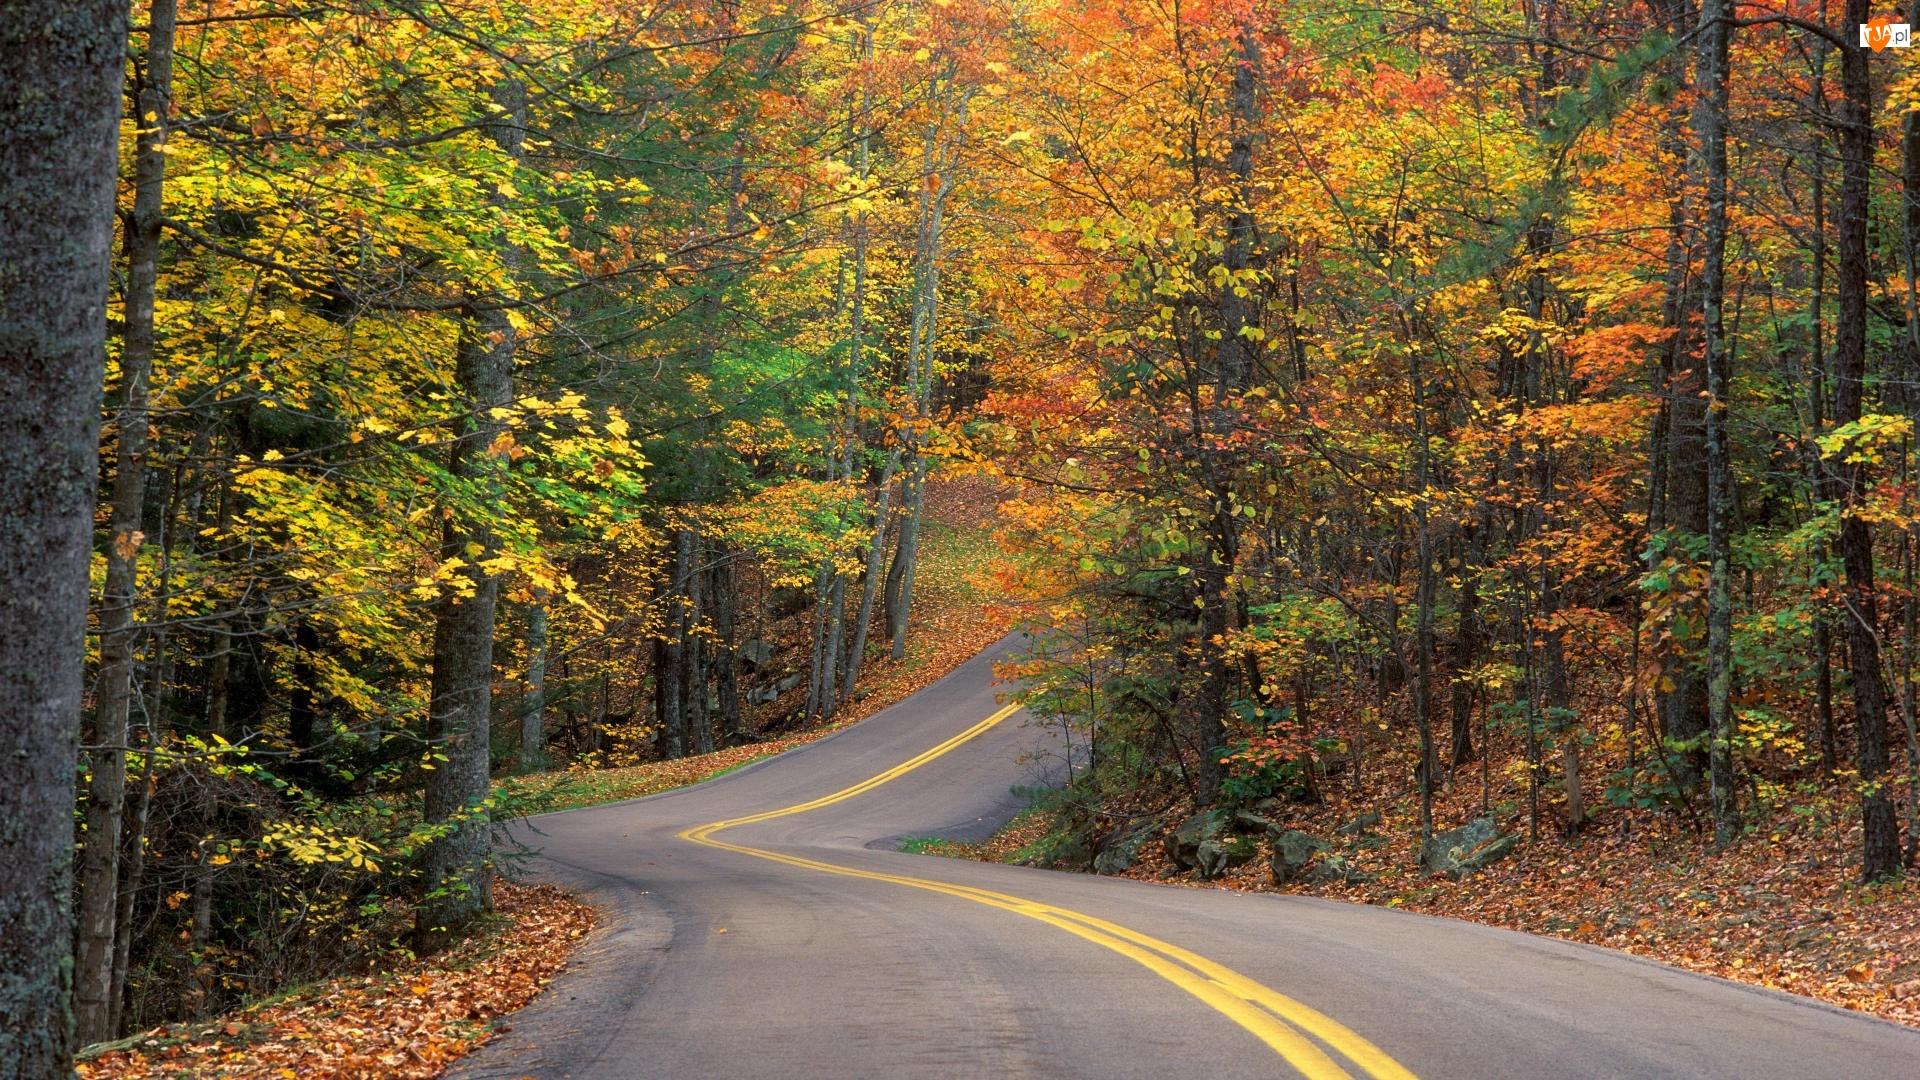 Droga, Jesienny, Las